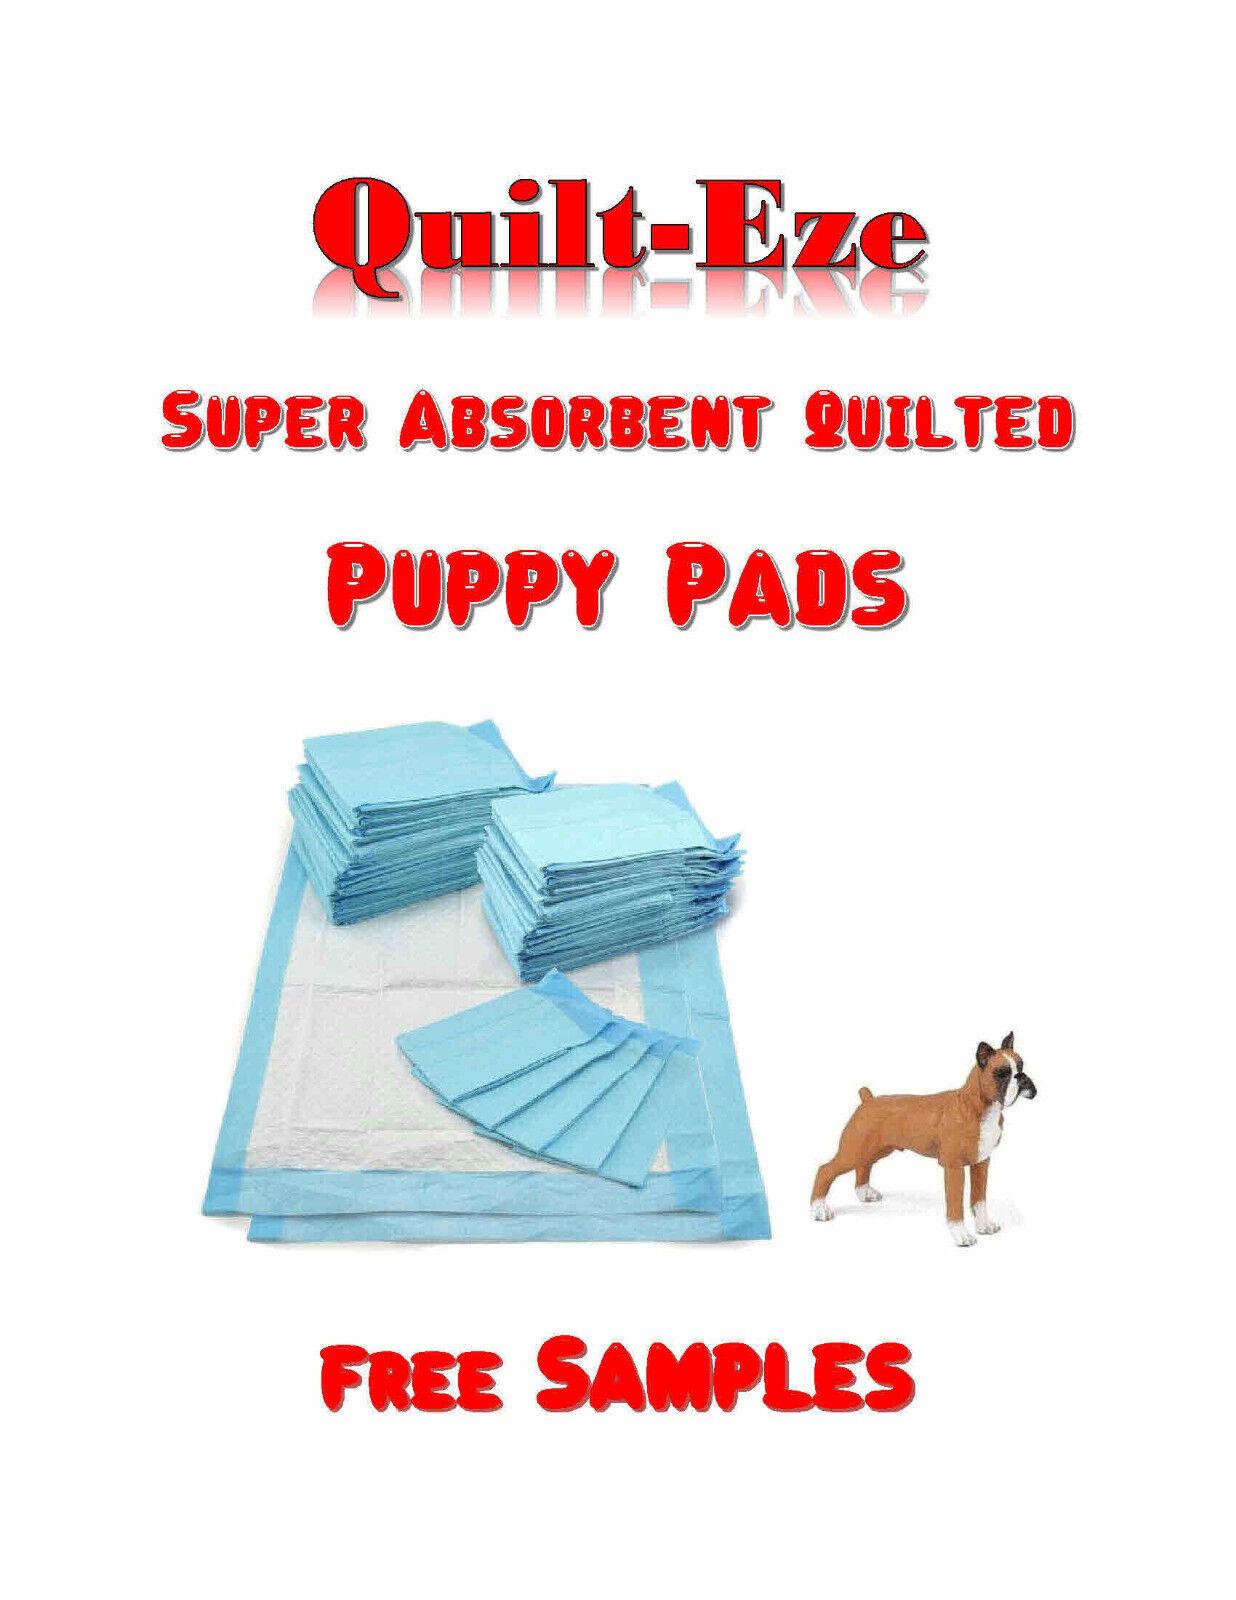 300-Quilt-Eze Super Absorbent Puppy Training Pee Pads 17x24   s BEST